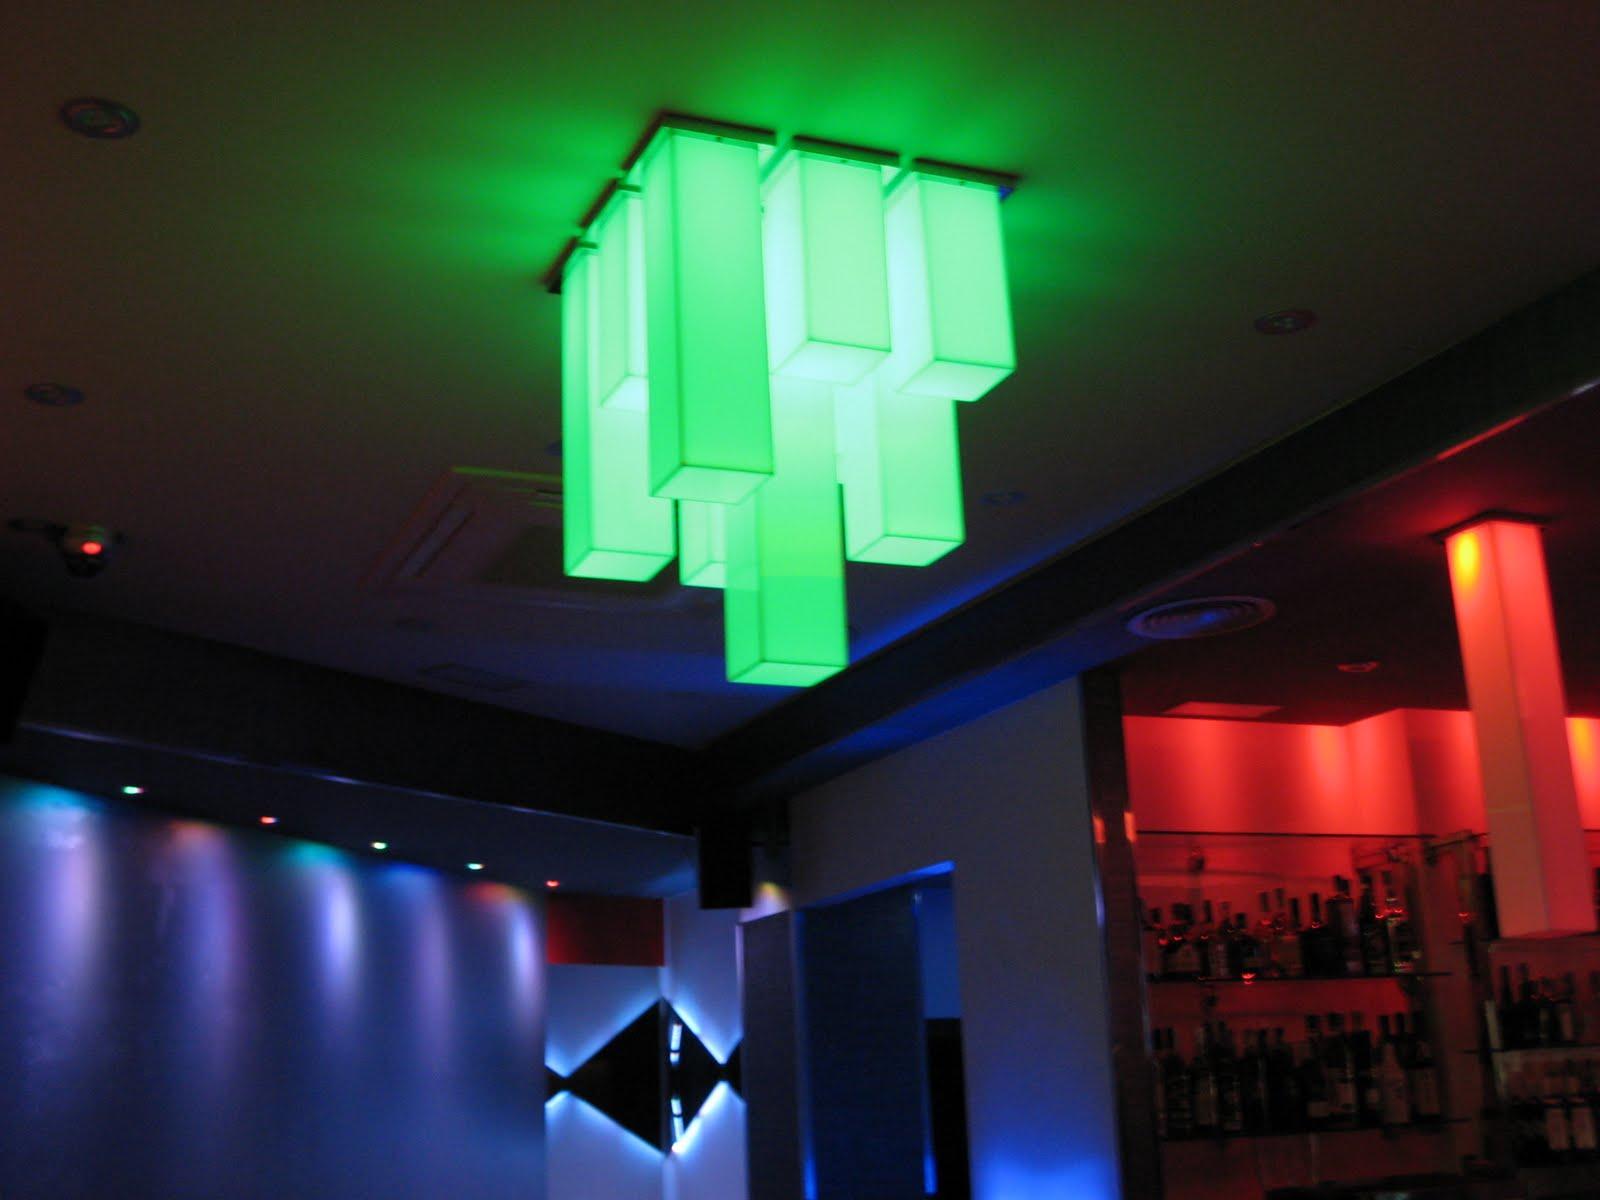 Ebled iluminacion pub sixty portonovo pontevedra - Iluminacion por leds ...